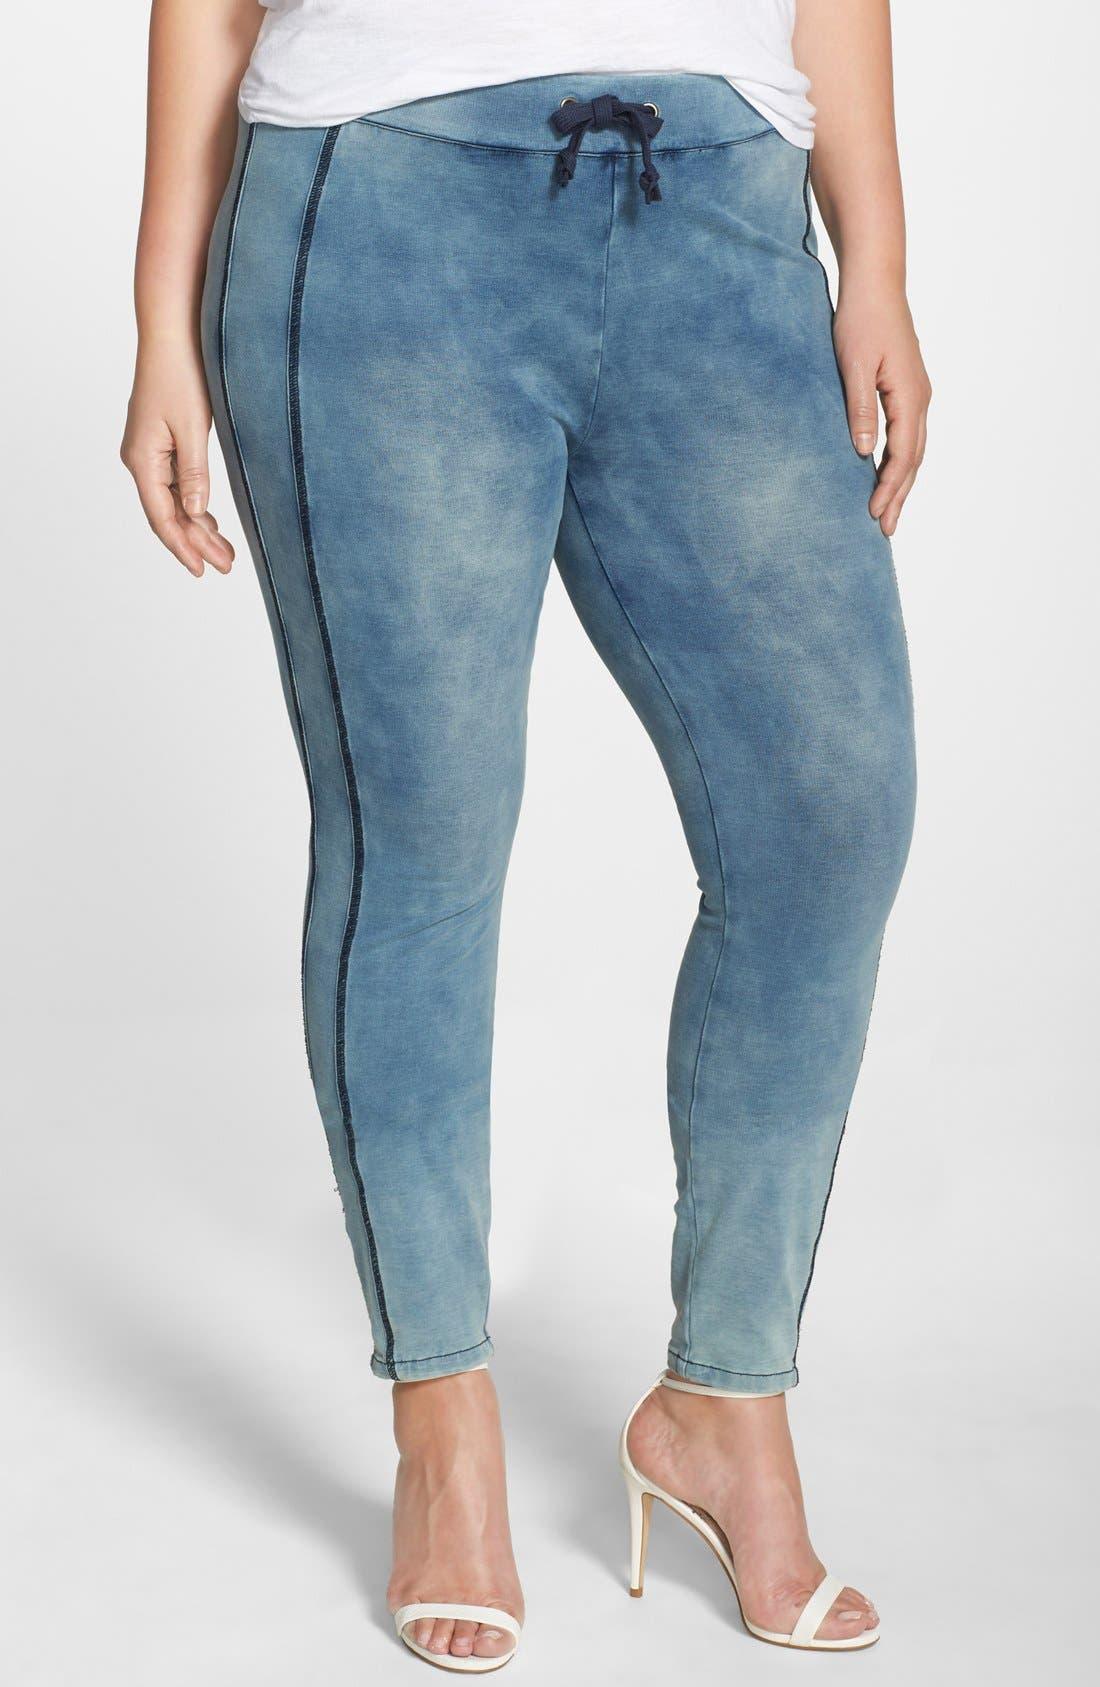 Poetic Justice 'Naomi' Stretch Knit Denim Jogger Pants (Plus Size)